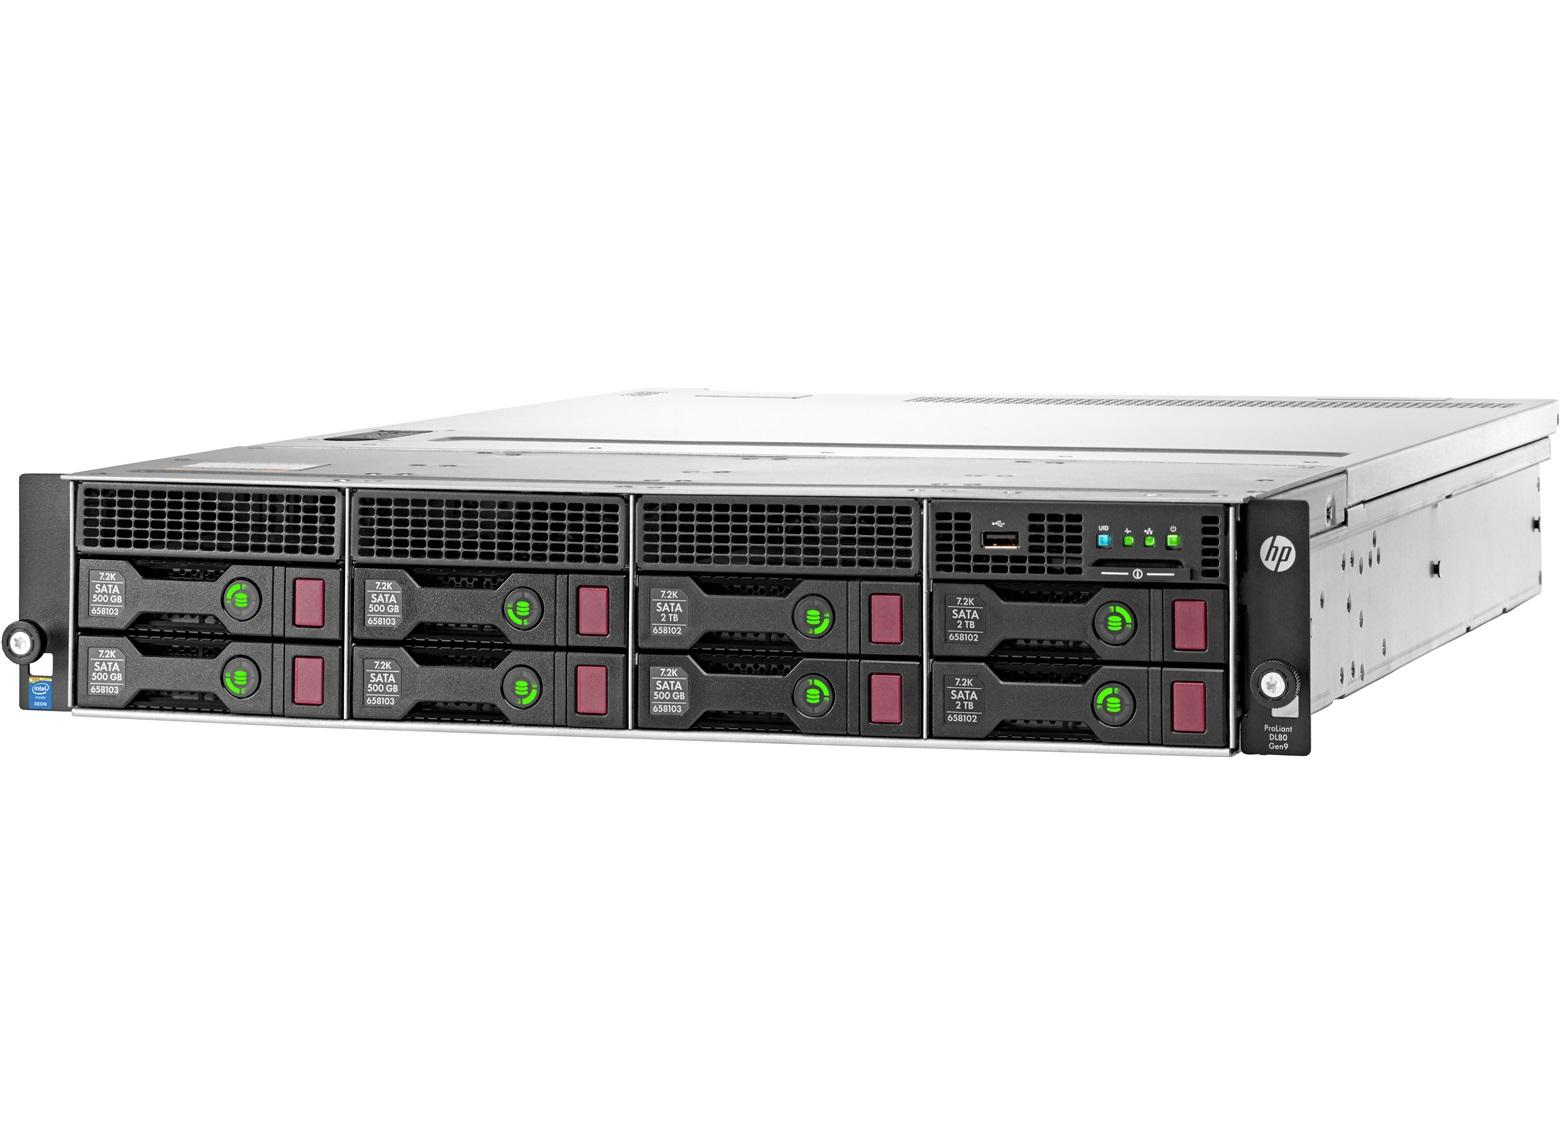 HP DL80 Gen9 E5-2603v3, 4GB, 8 LFF, B140